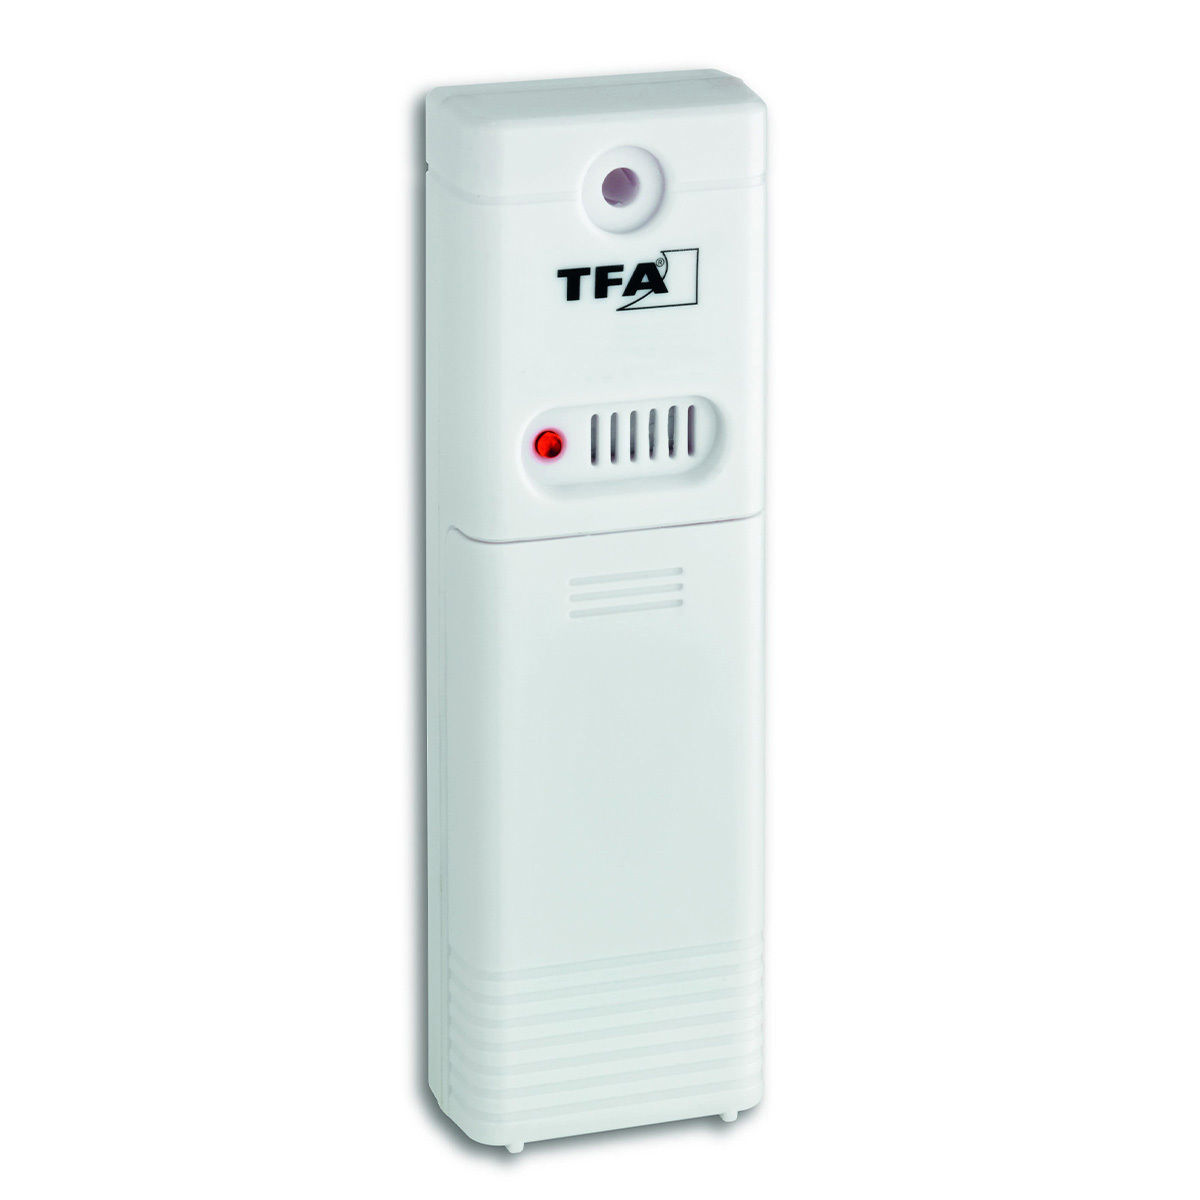 30-3064-01-funk-thermometer-mit-farbdisplay-spira-sender-1200x1200px.jpg